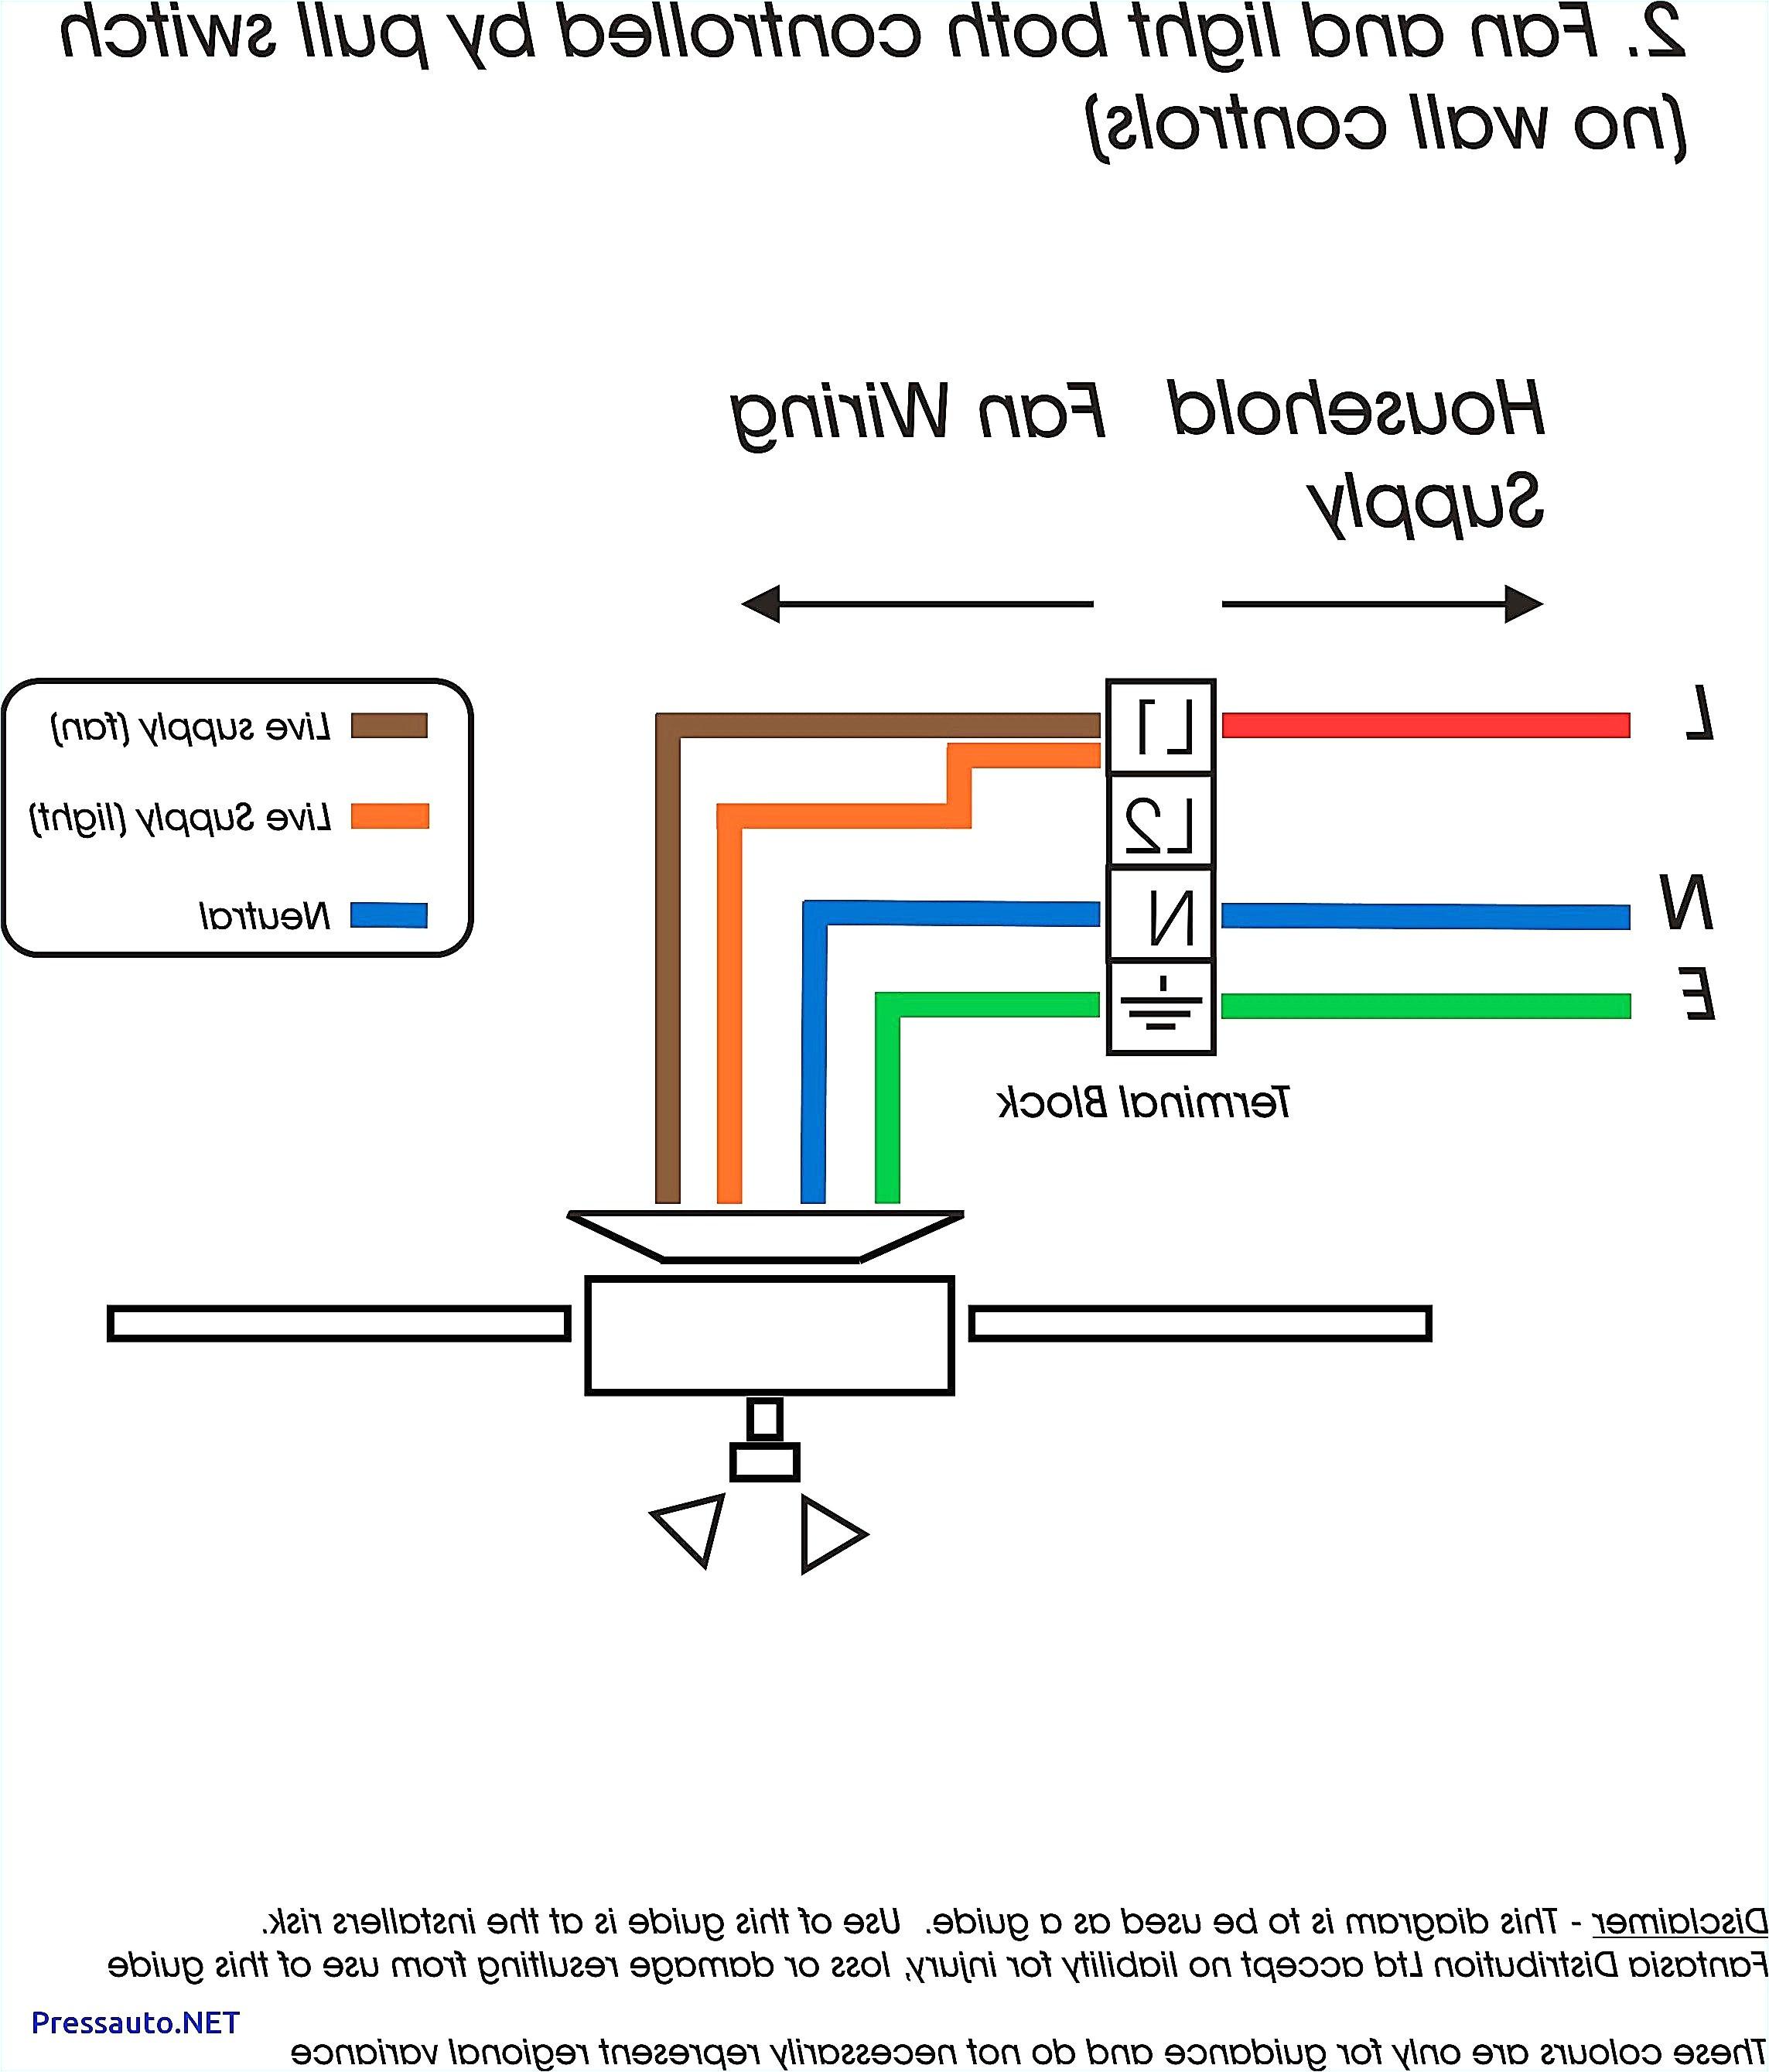 gm alternator wiring diagram new gm alternator wiring diagramgm alternator wiring diagram new gm alternator wiring